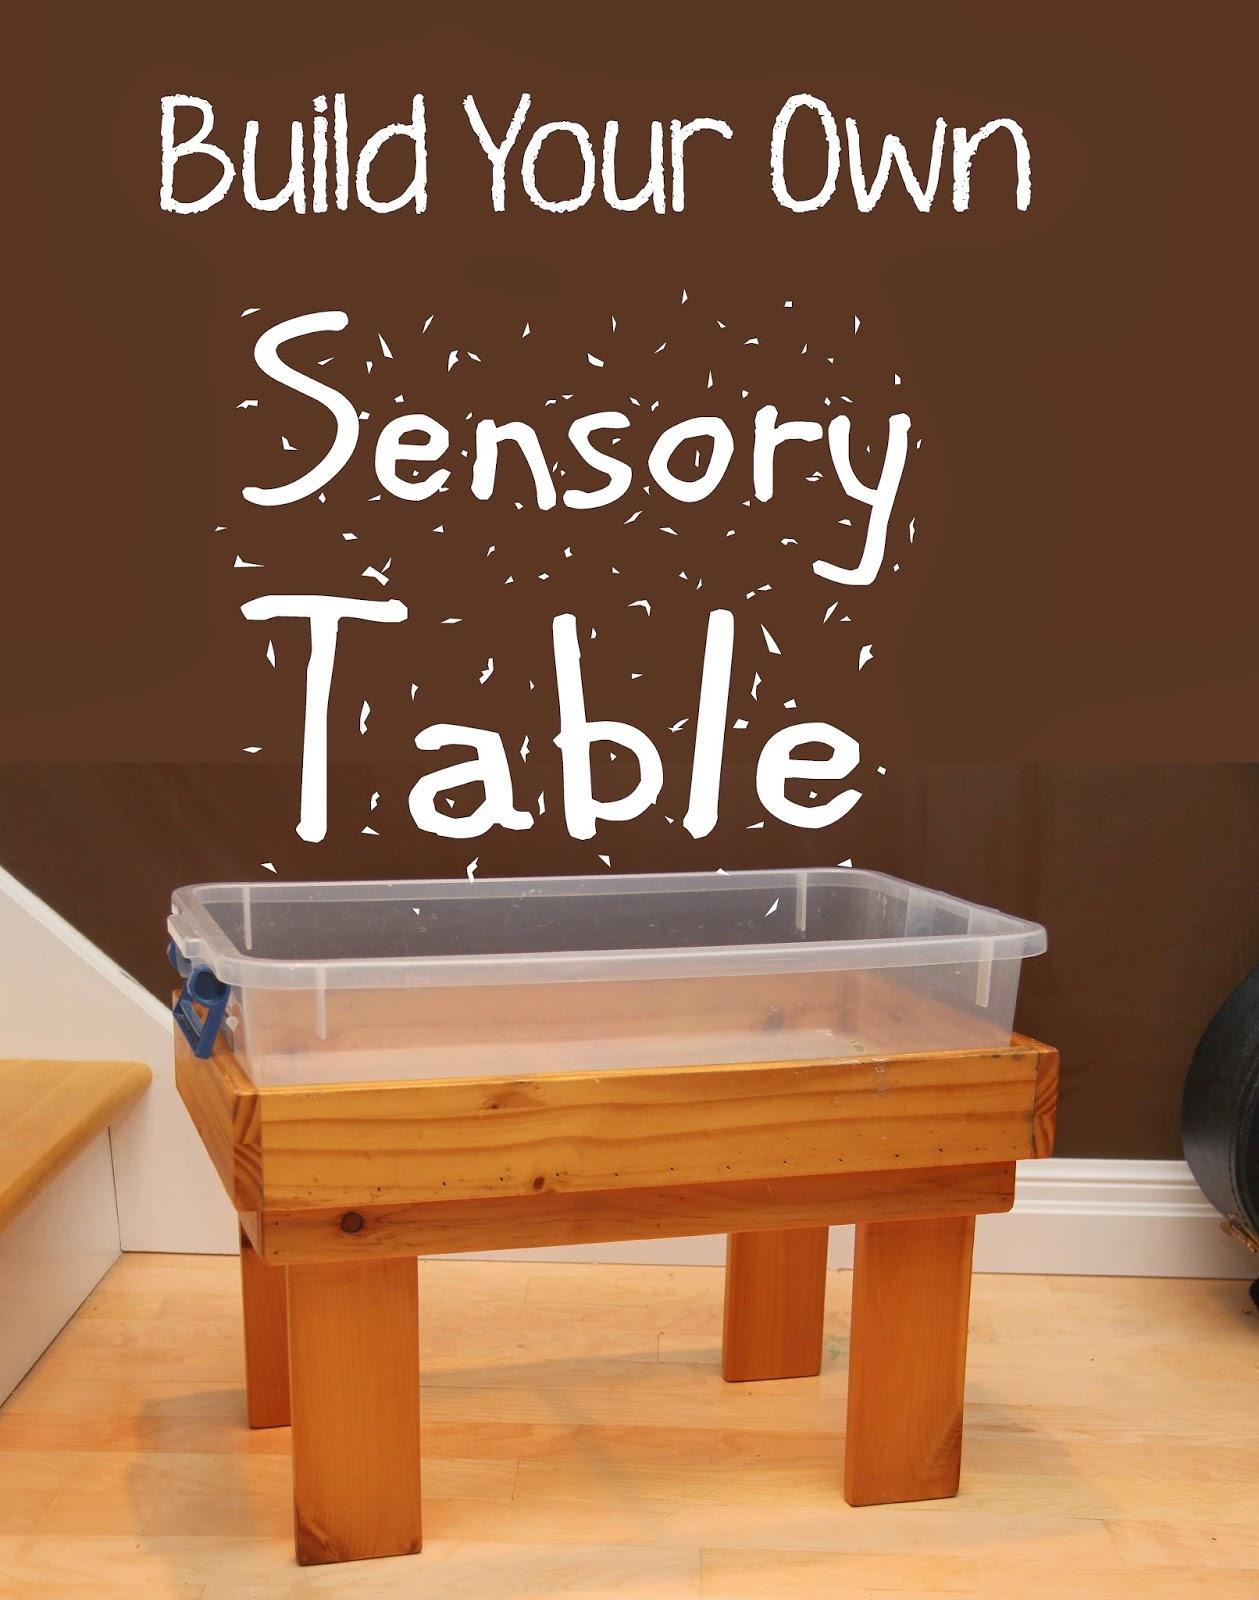 blue sky parent build your own sensory table. Black Bedroom Furniture Sets. Home Design Ideas